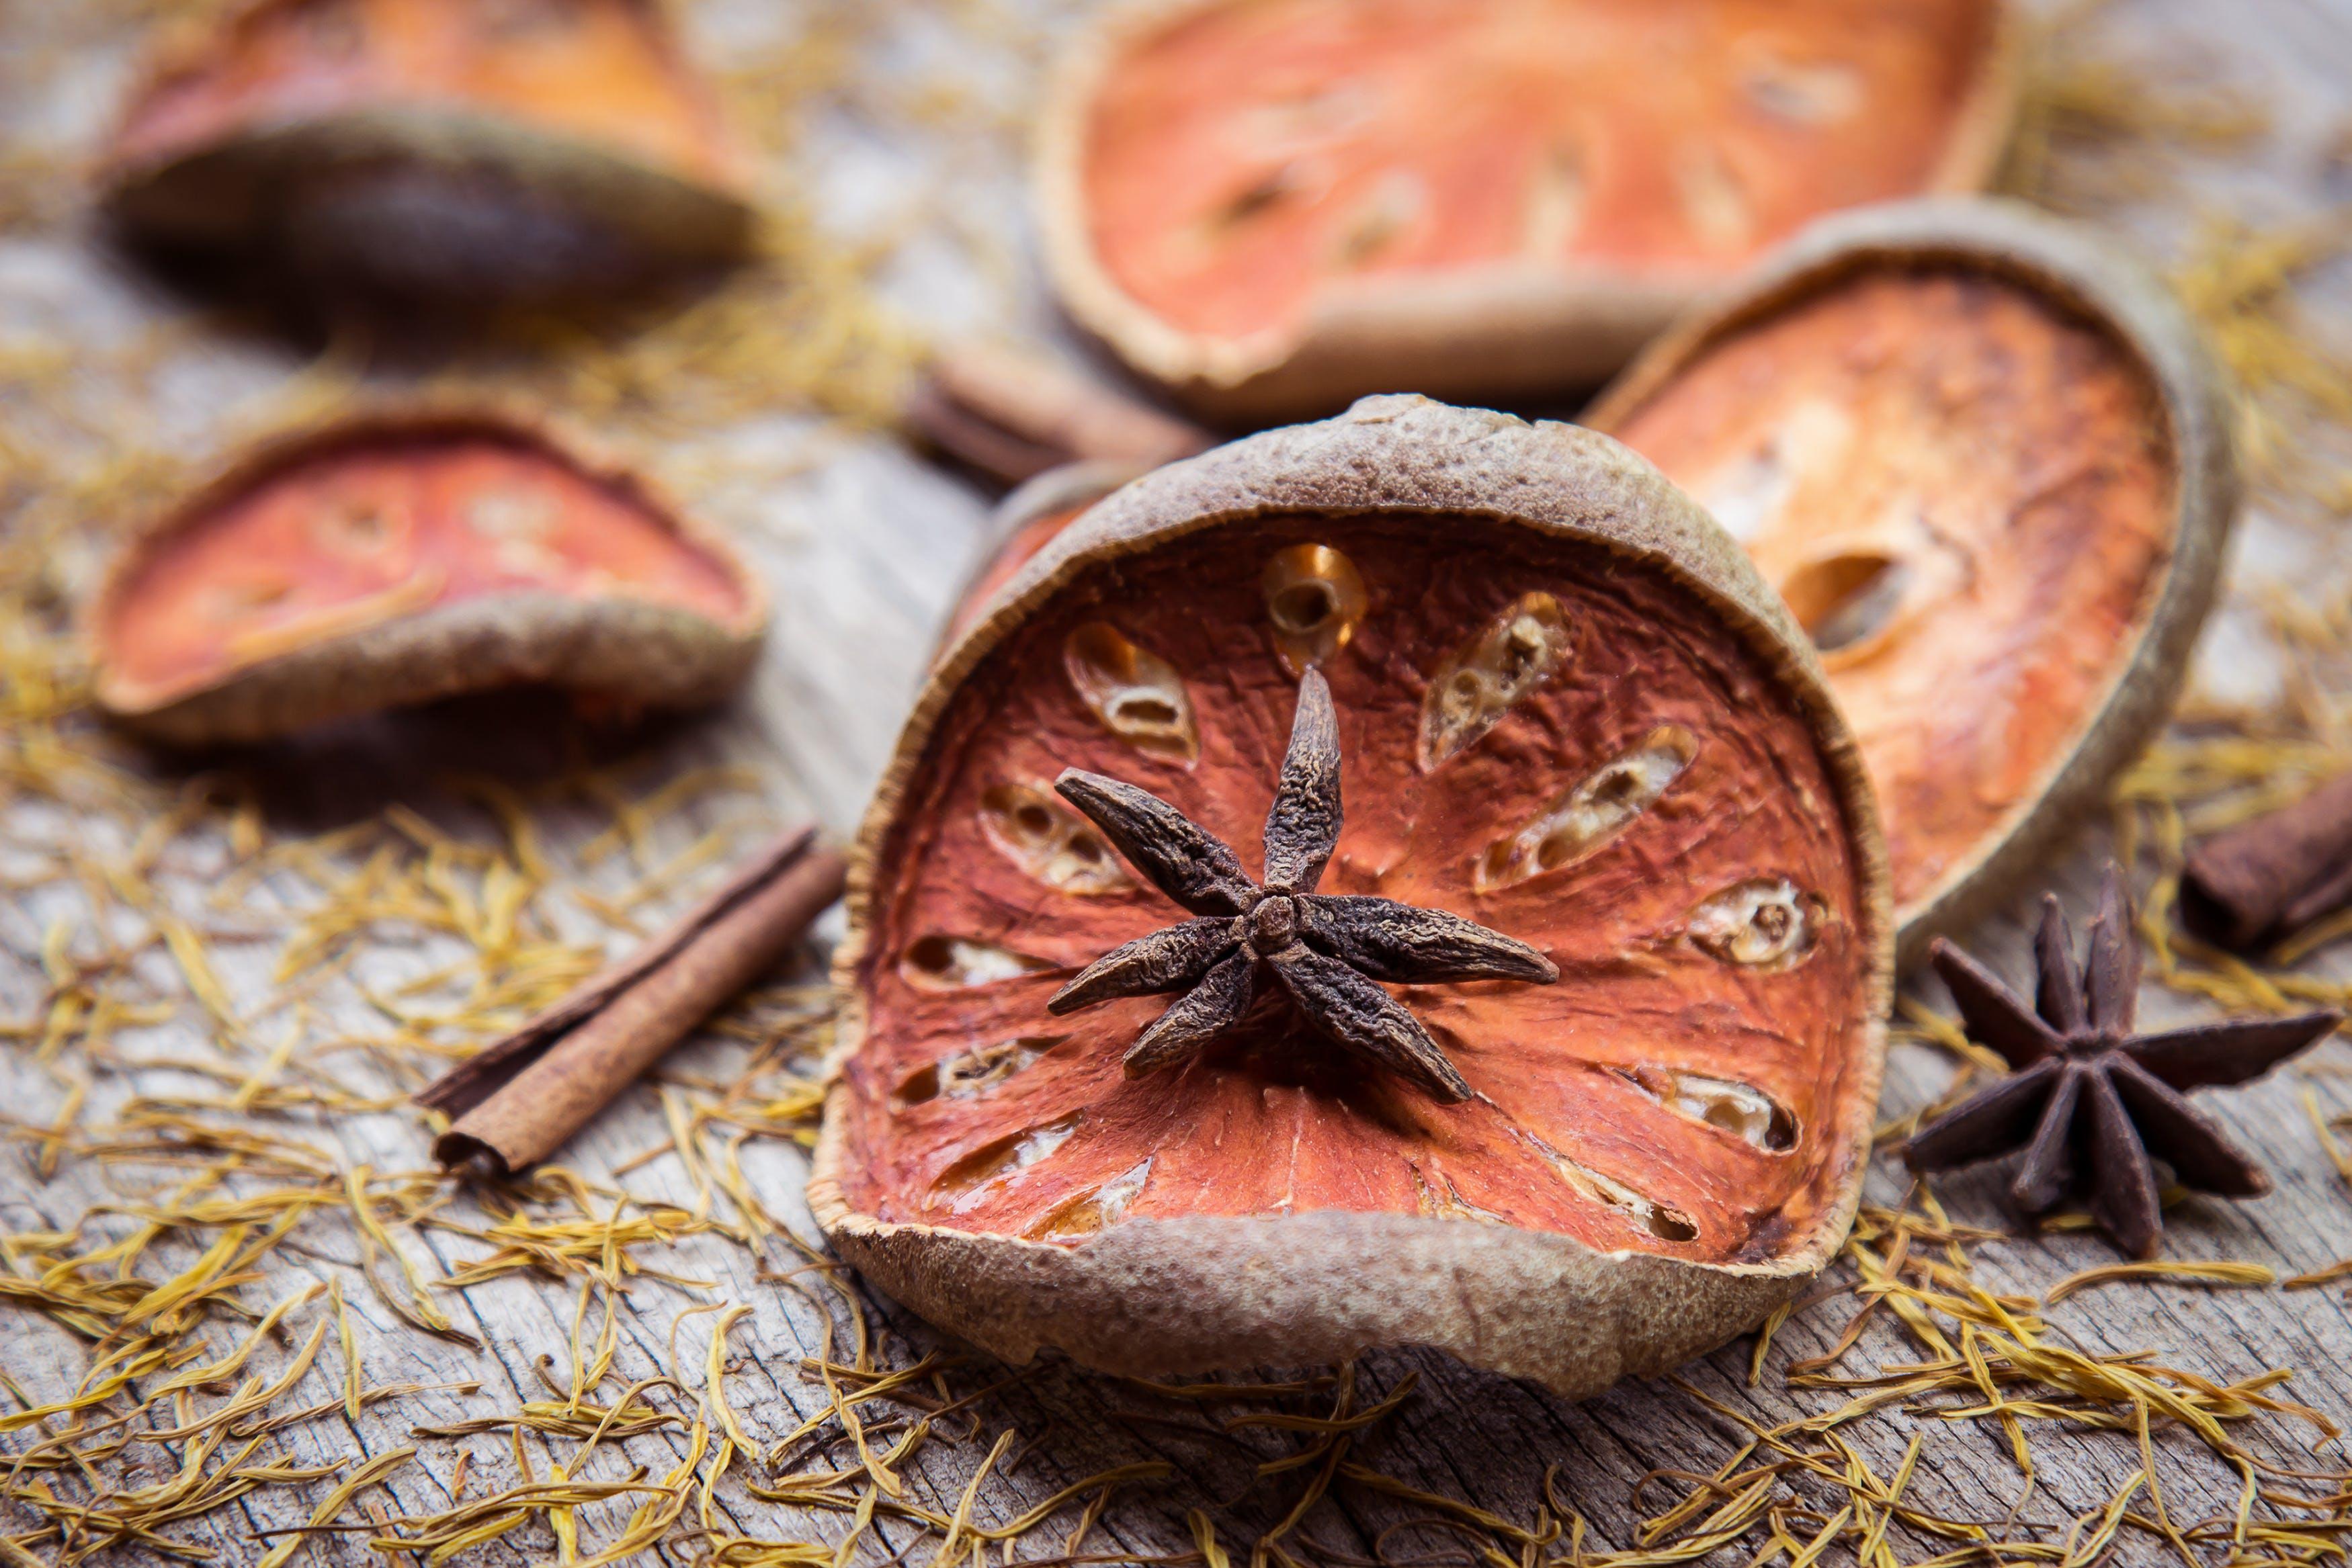 Kostenloses Stock Foto zu alternative medizin, aroma, blütenstaub, braun